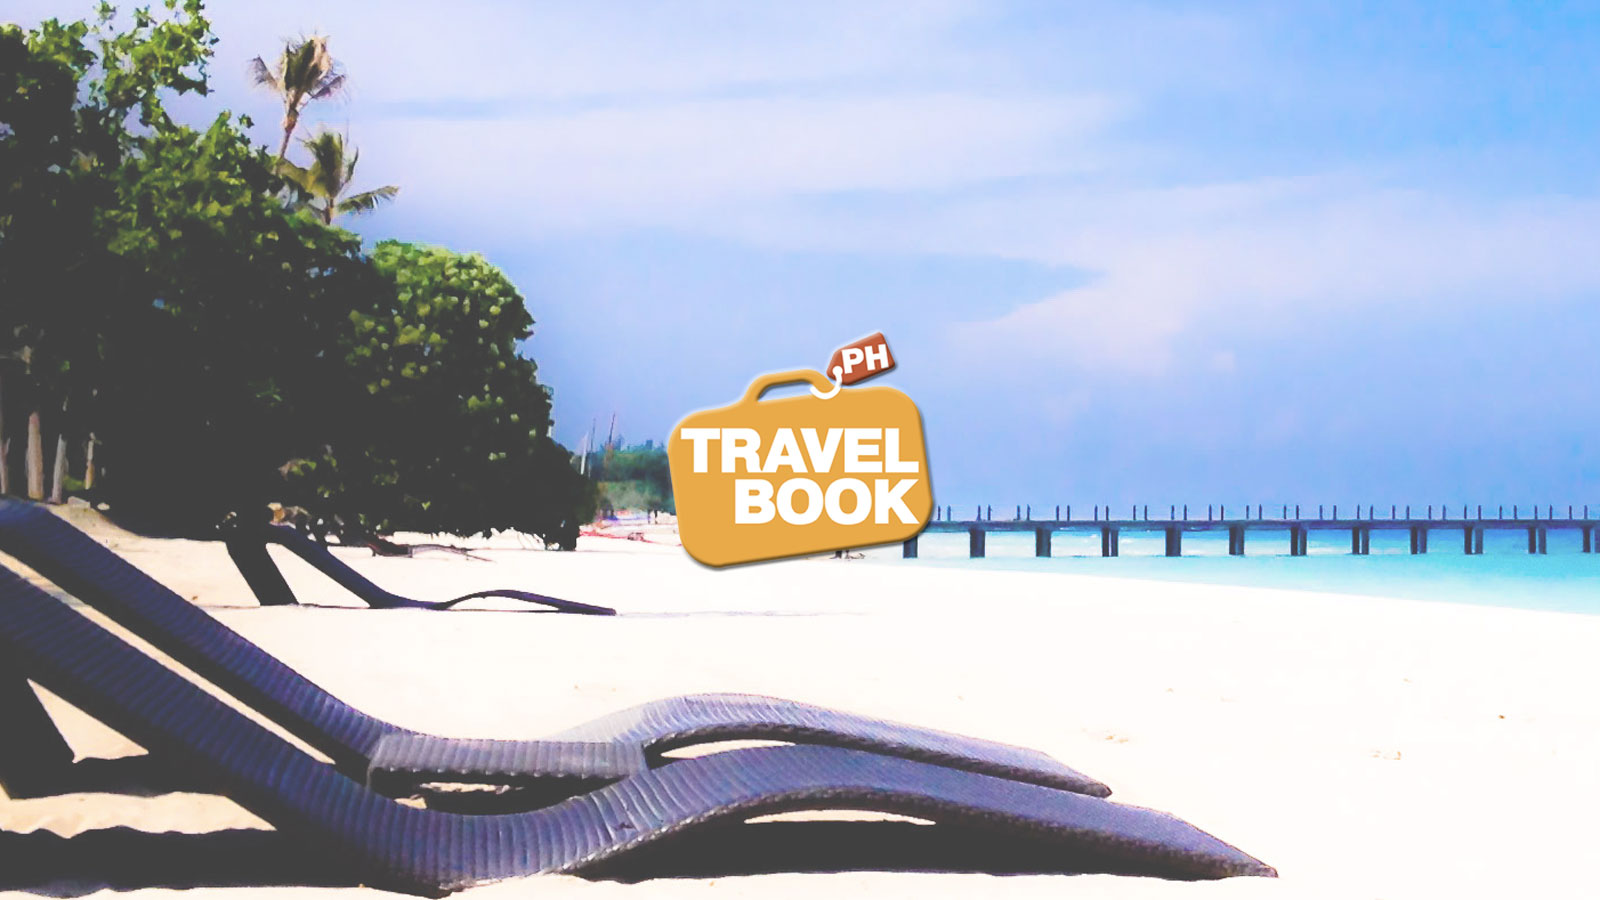 Be a Travelbook.ph affiliate